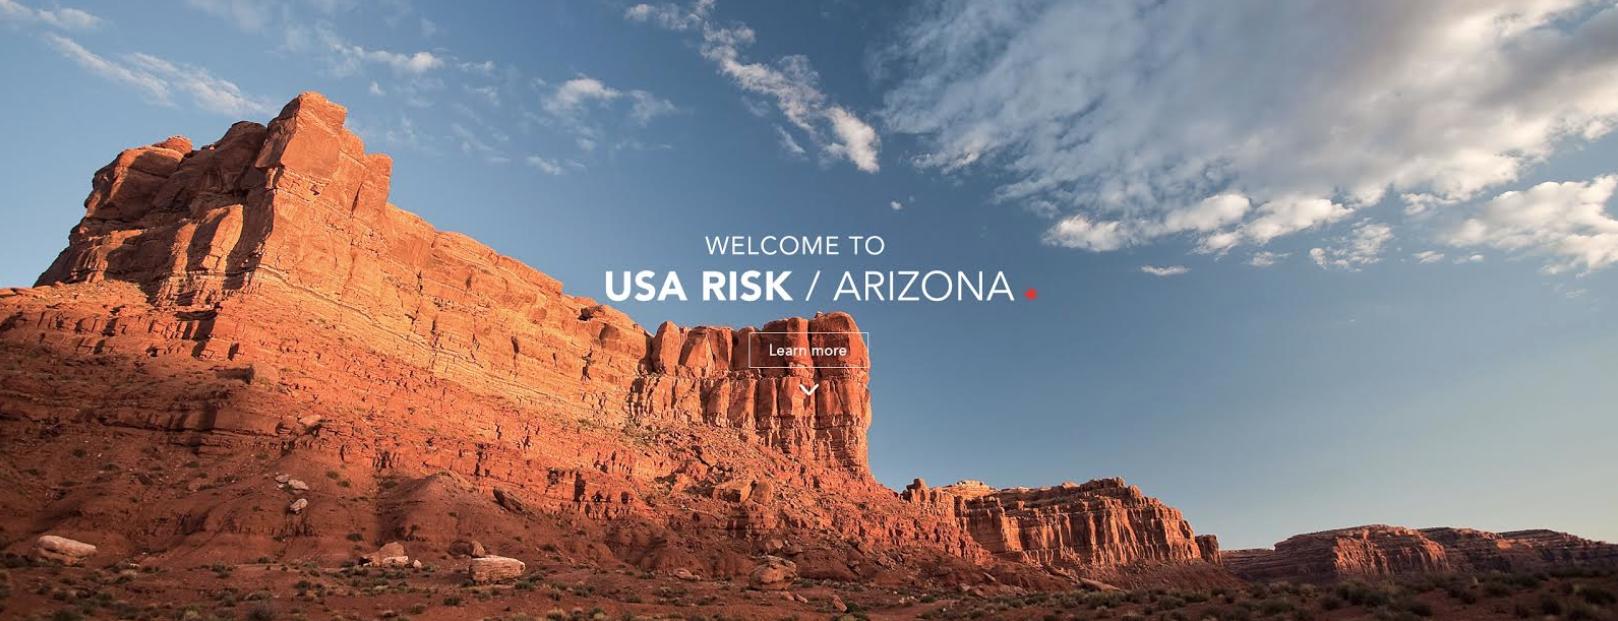 USA Risk Arizona Captive Insurance.png